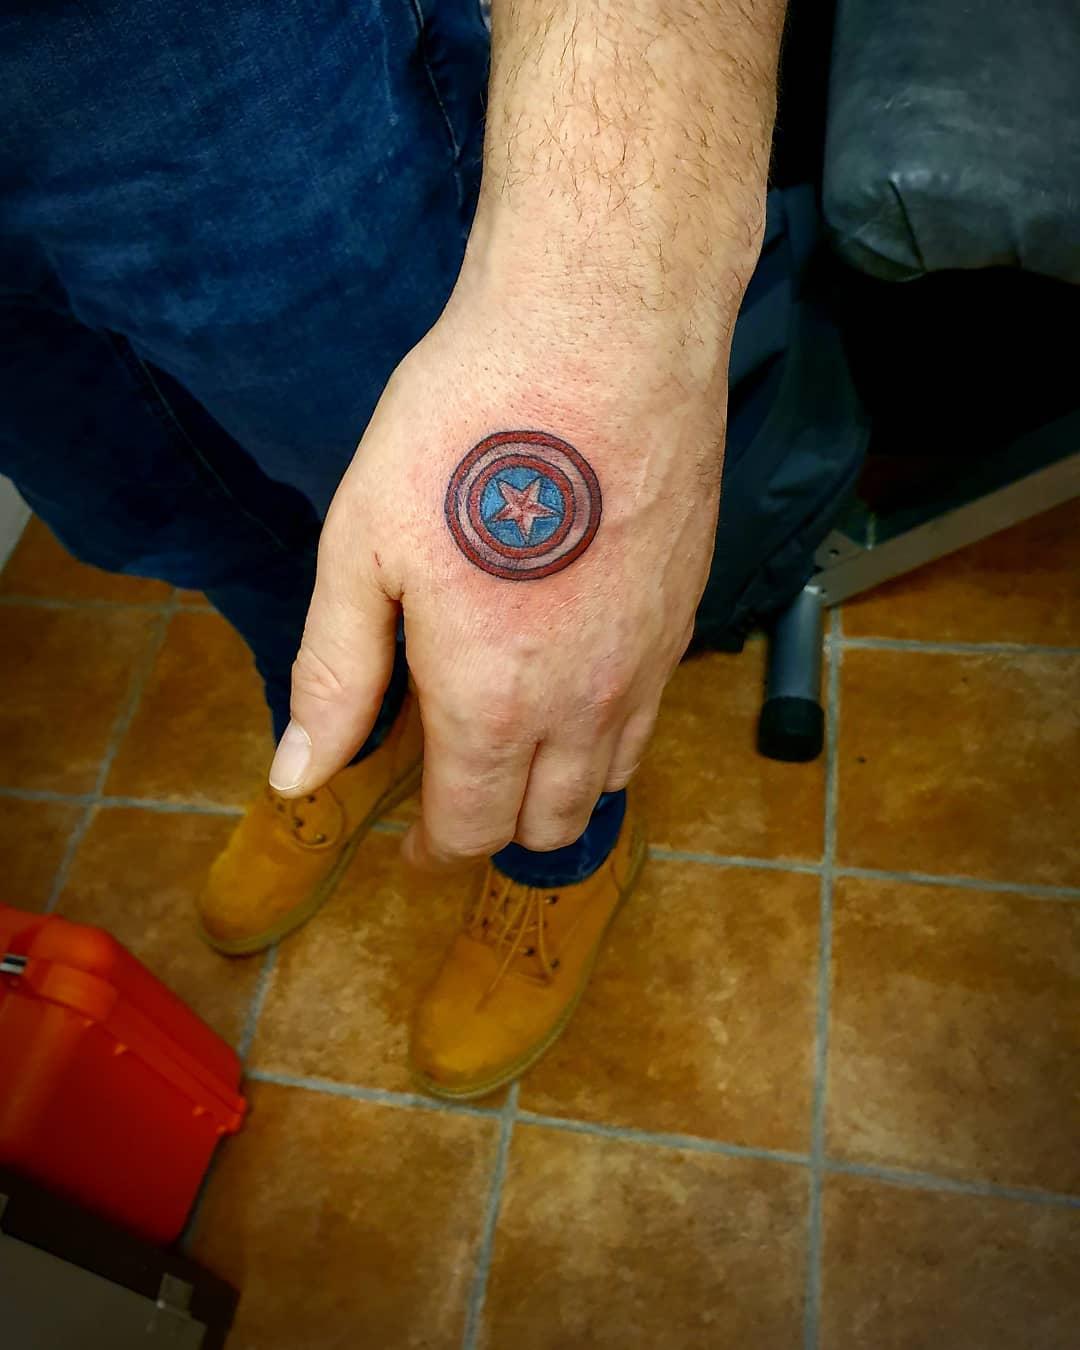 Captain America's shield on hand tattoo